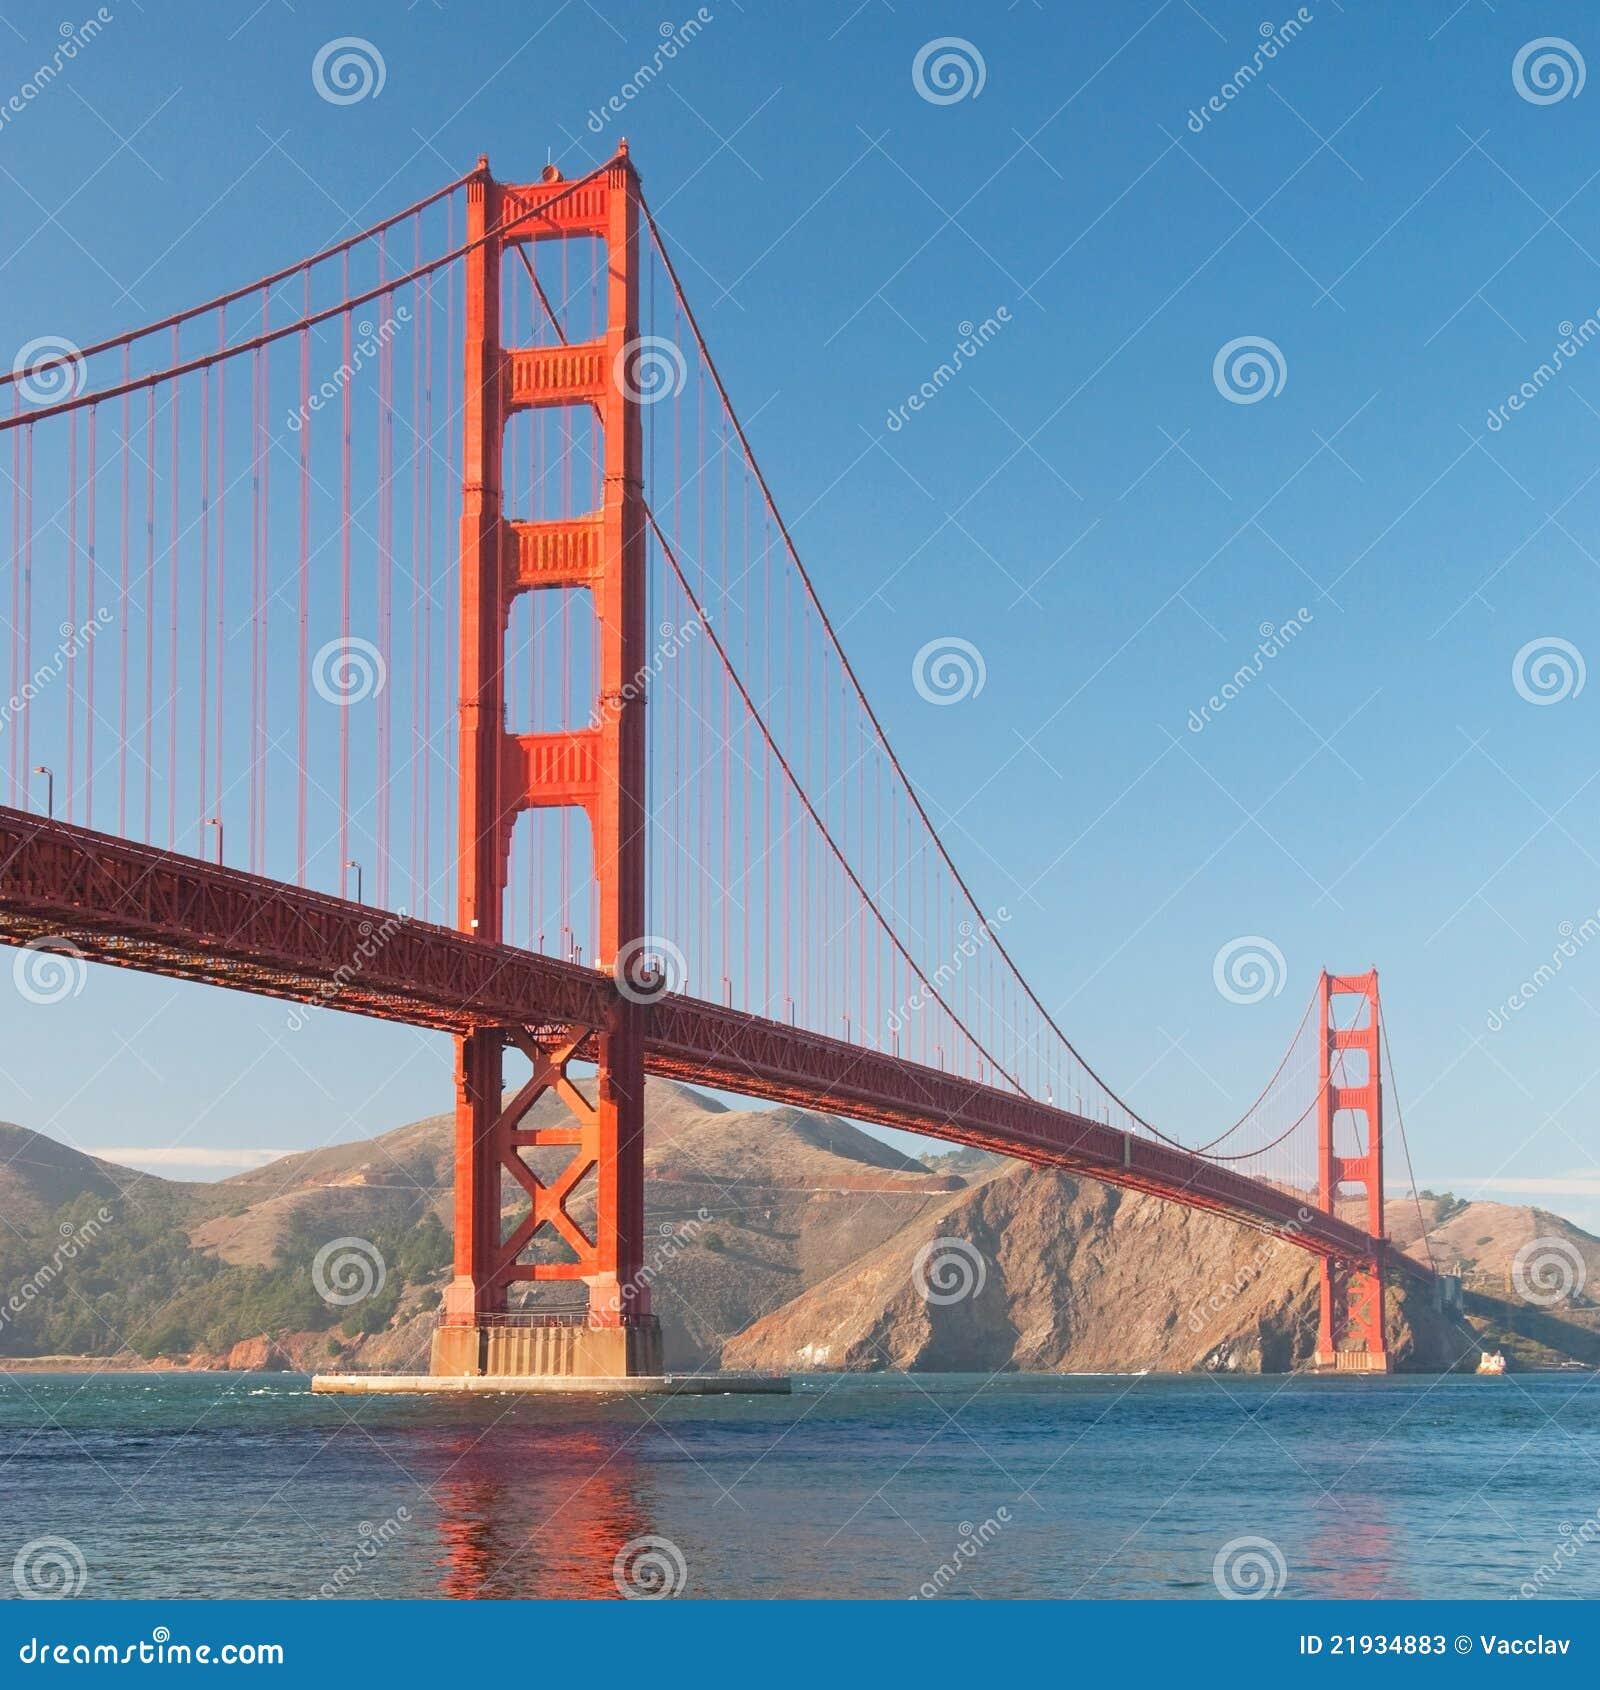 Golden Gate Bridge San Francisco California Sunset Picture: The Golden Gate Bridge In San Francisco Sunset Stock